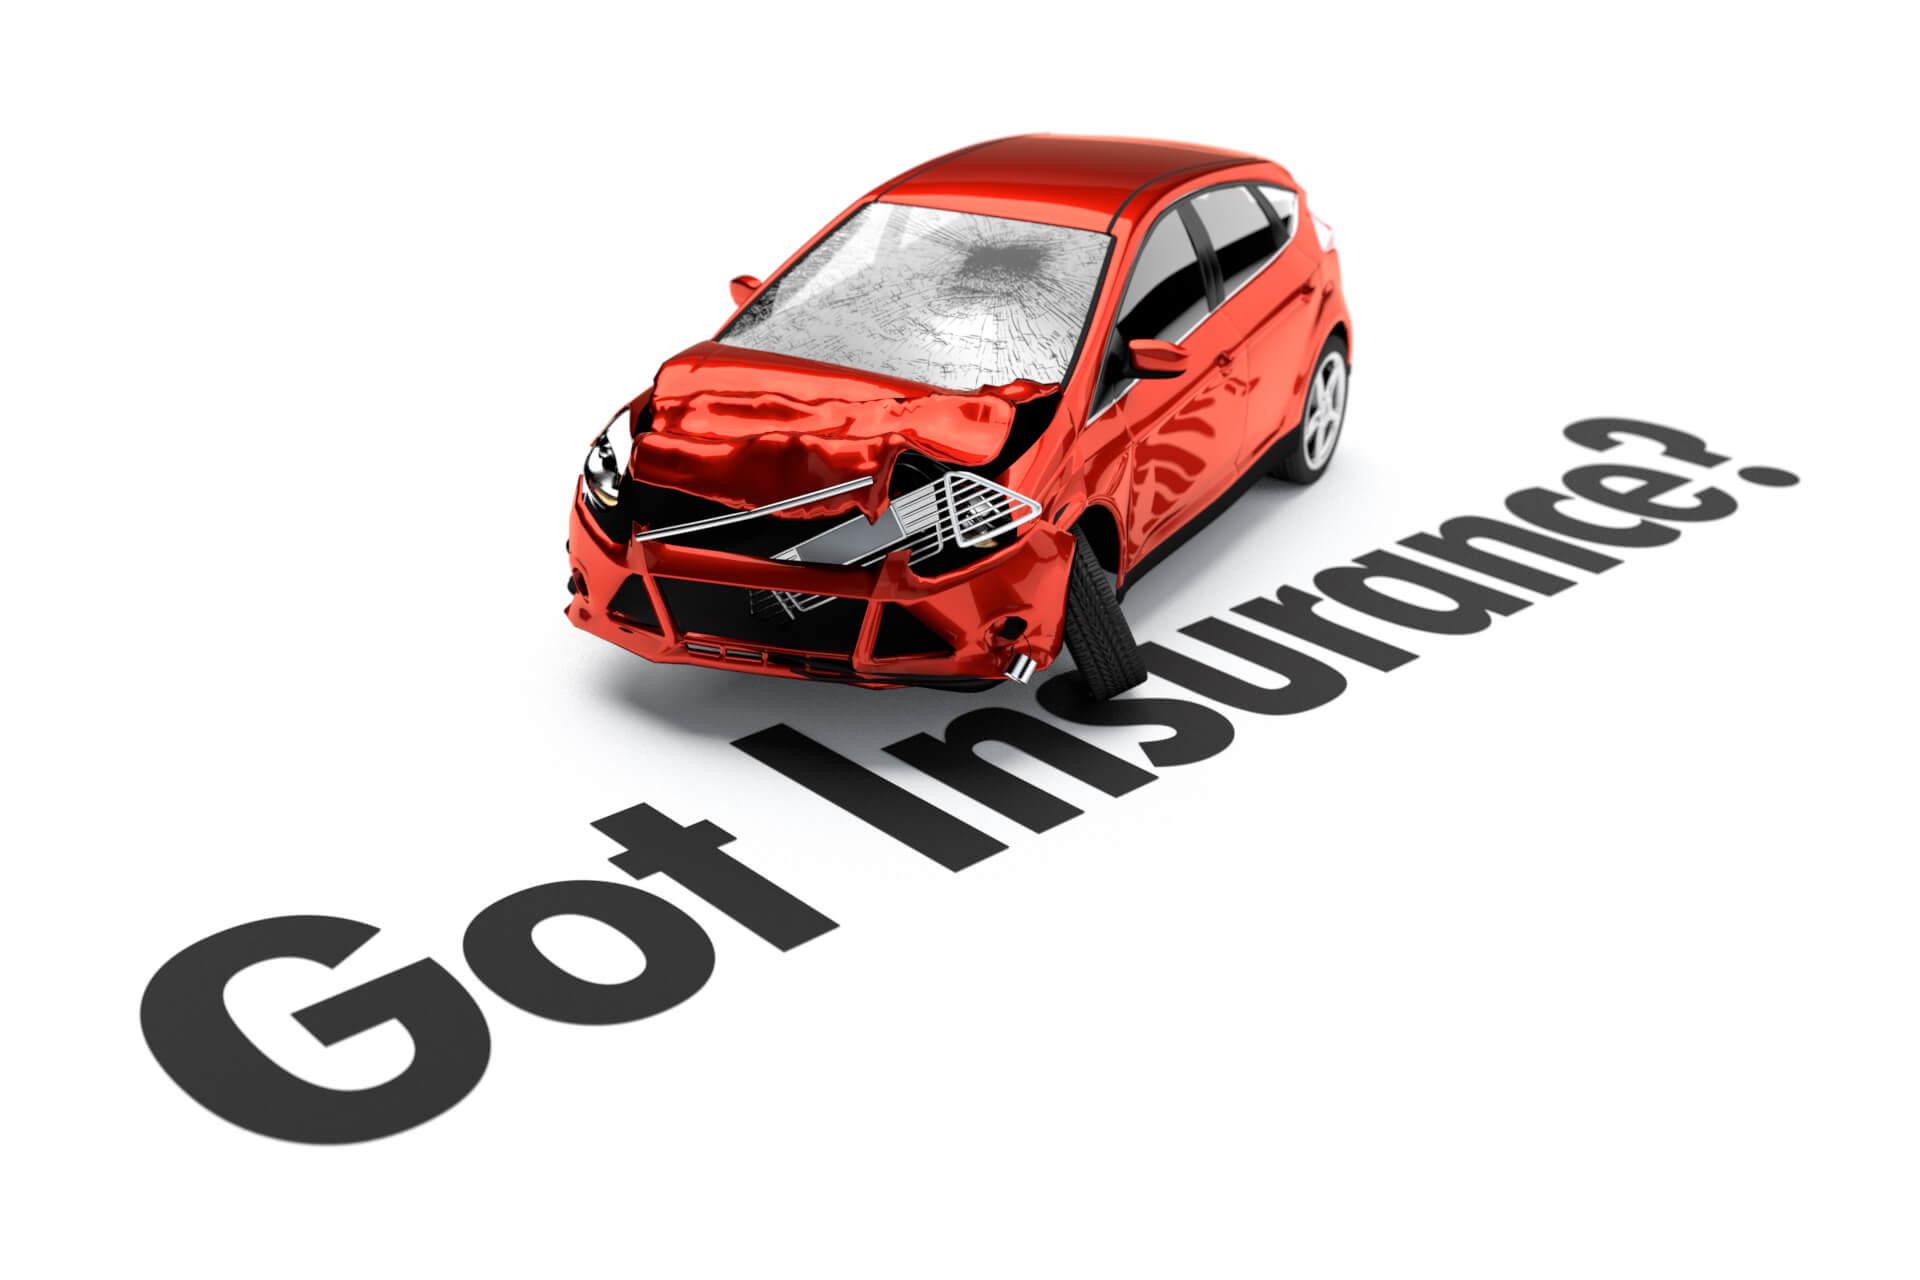 Got car insurance free image download